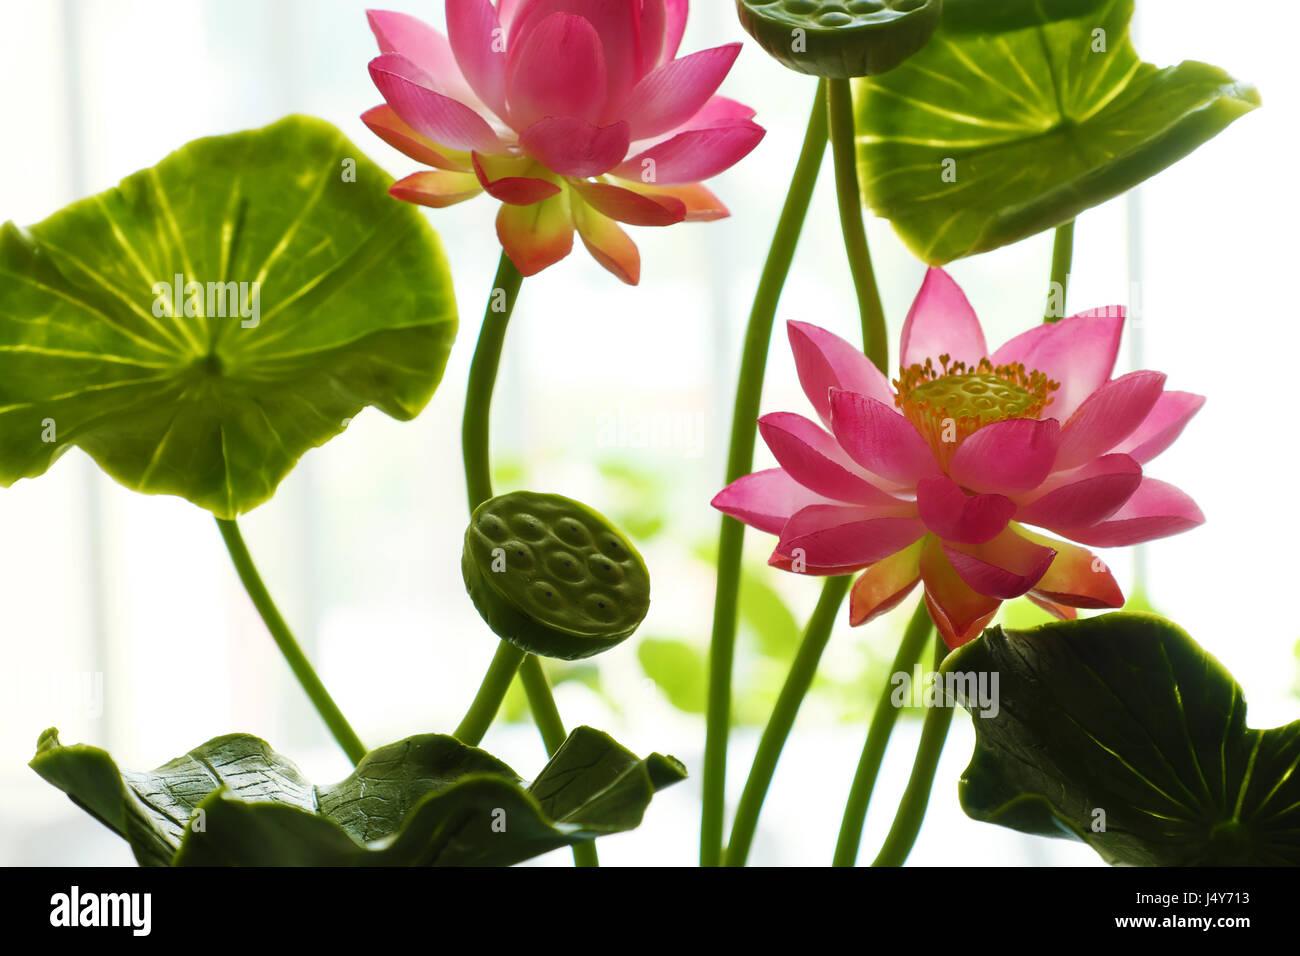 Artificial Flower Handmade Lotus Flower Stock Photos Artificial